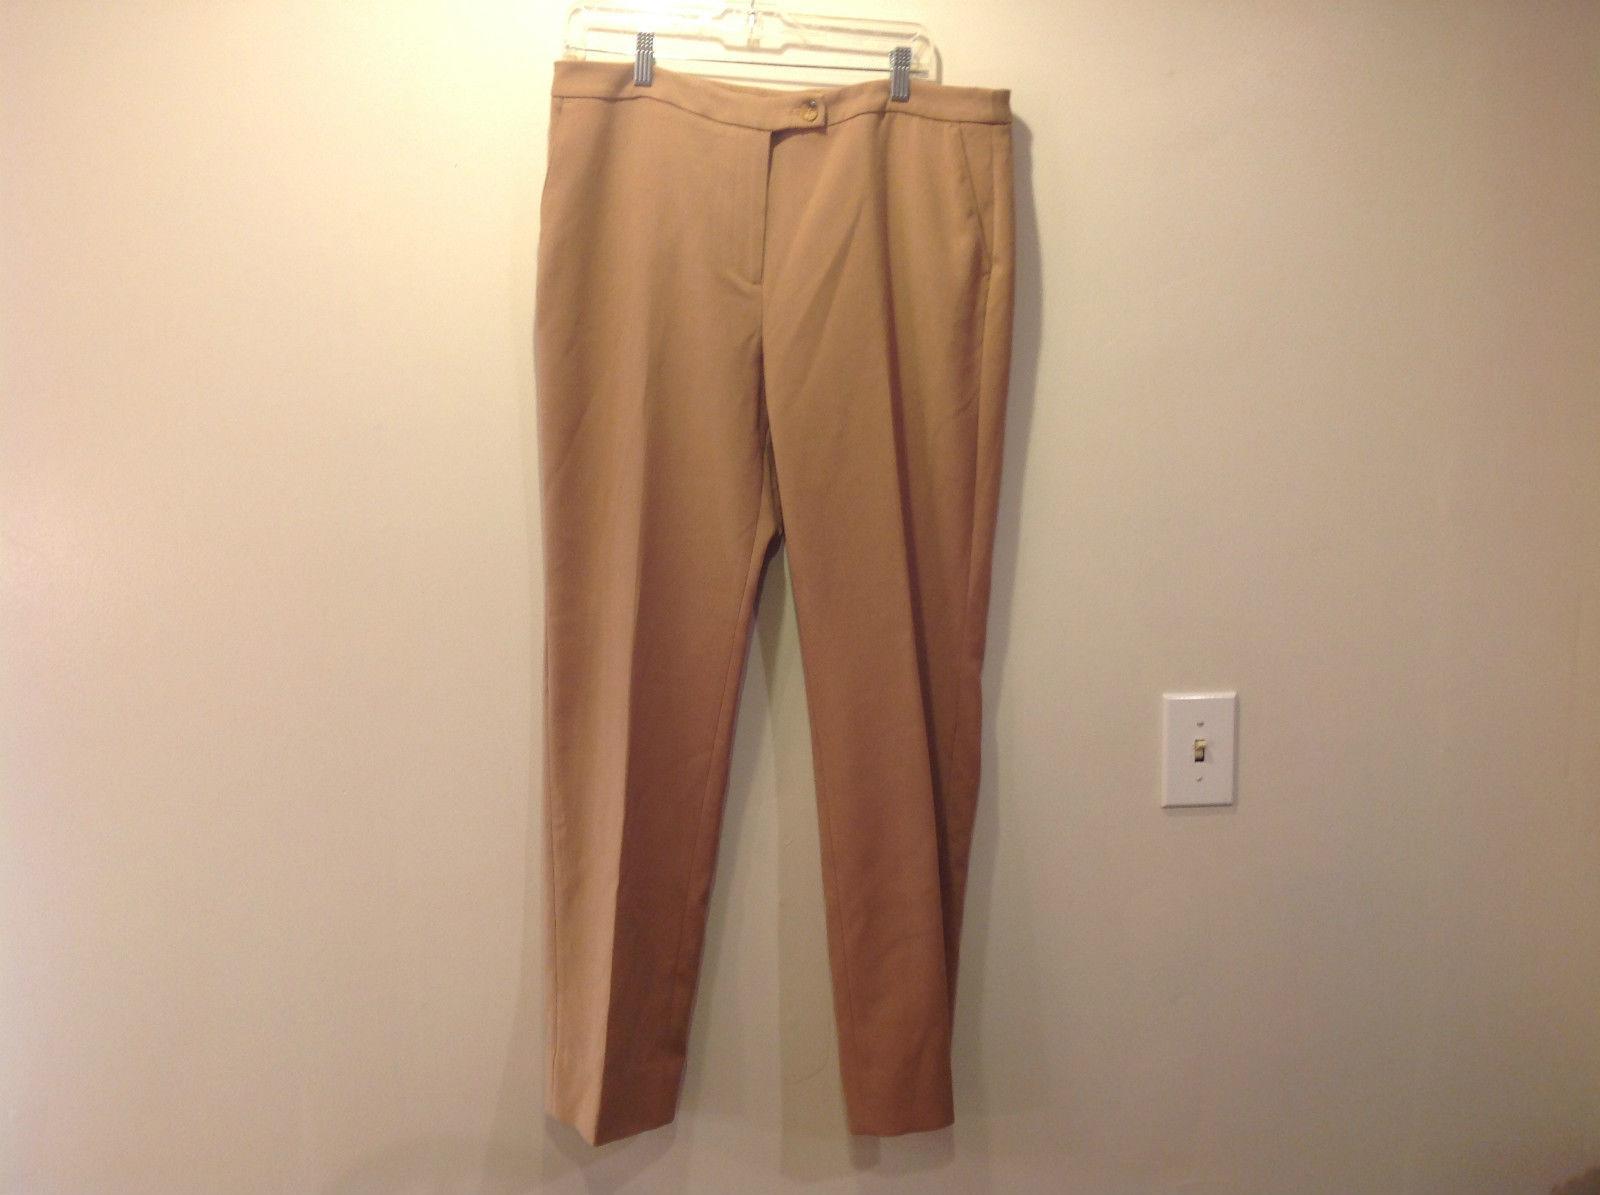 Jones New York Tan Flat Front Dress Pants Stretch Size 14 Good Condition